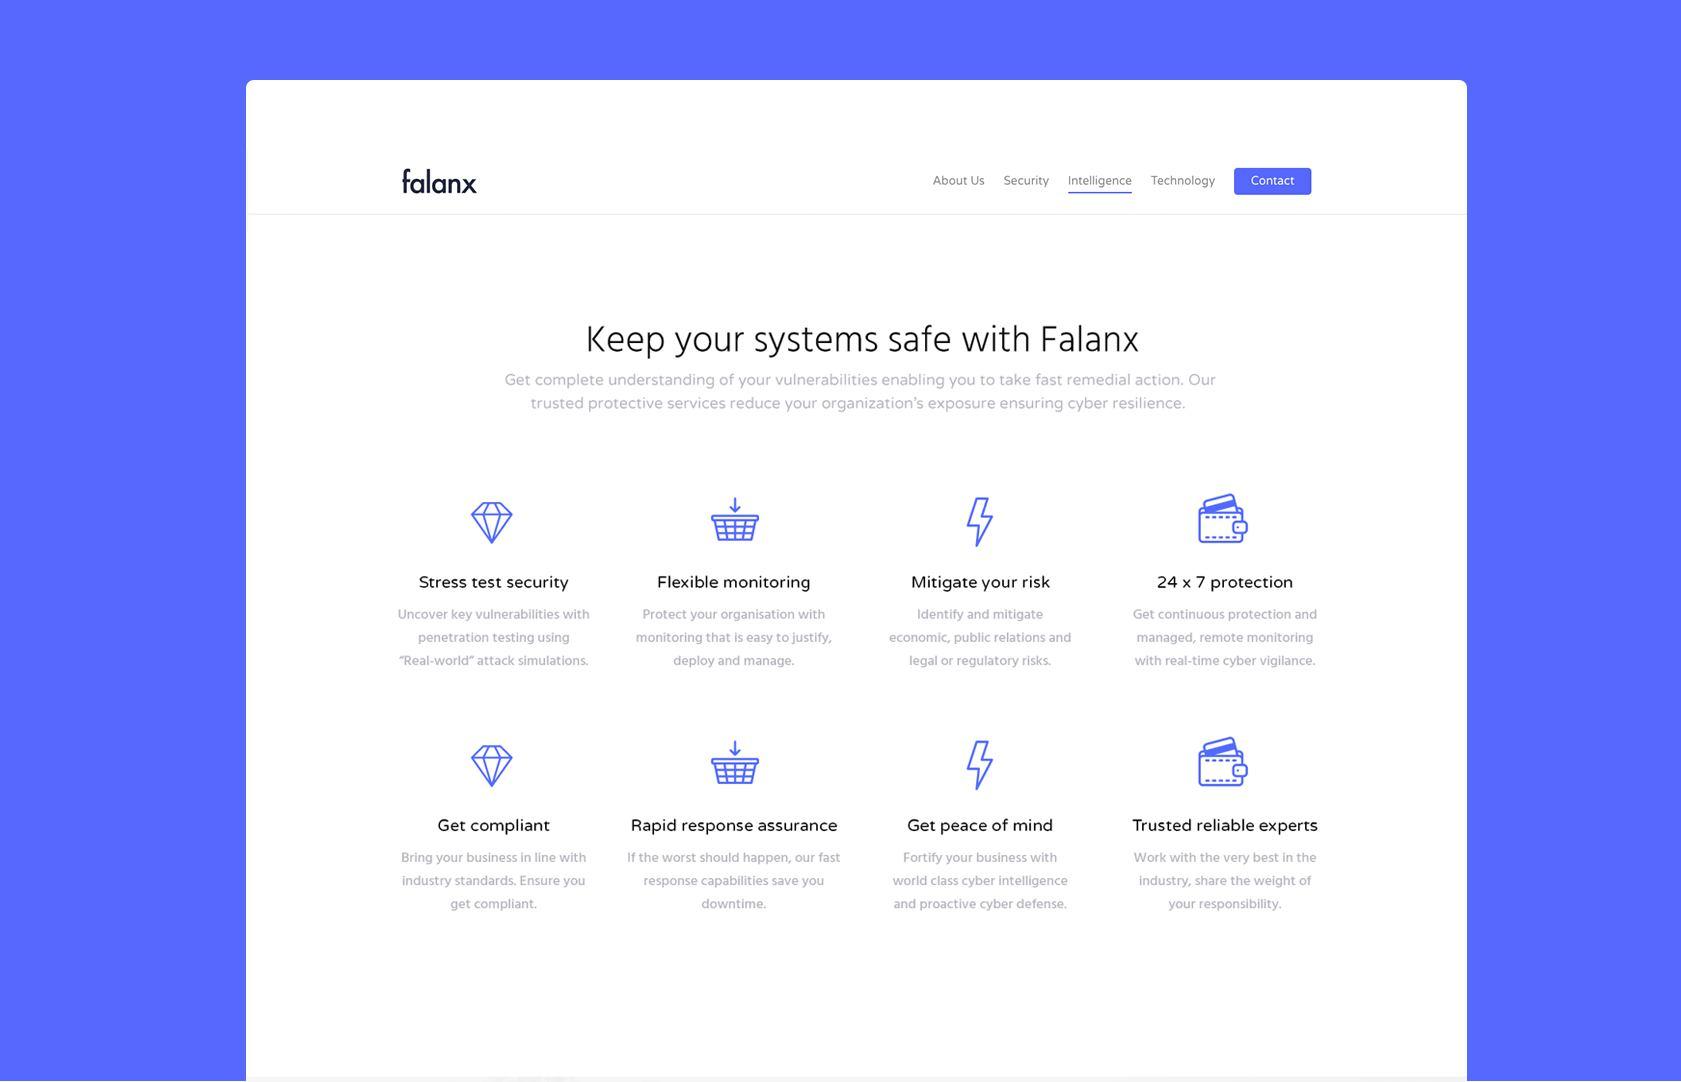 Falanx home page